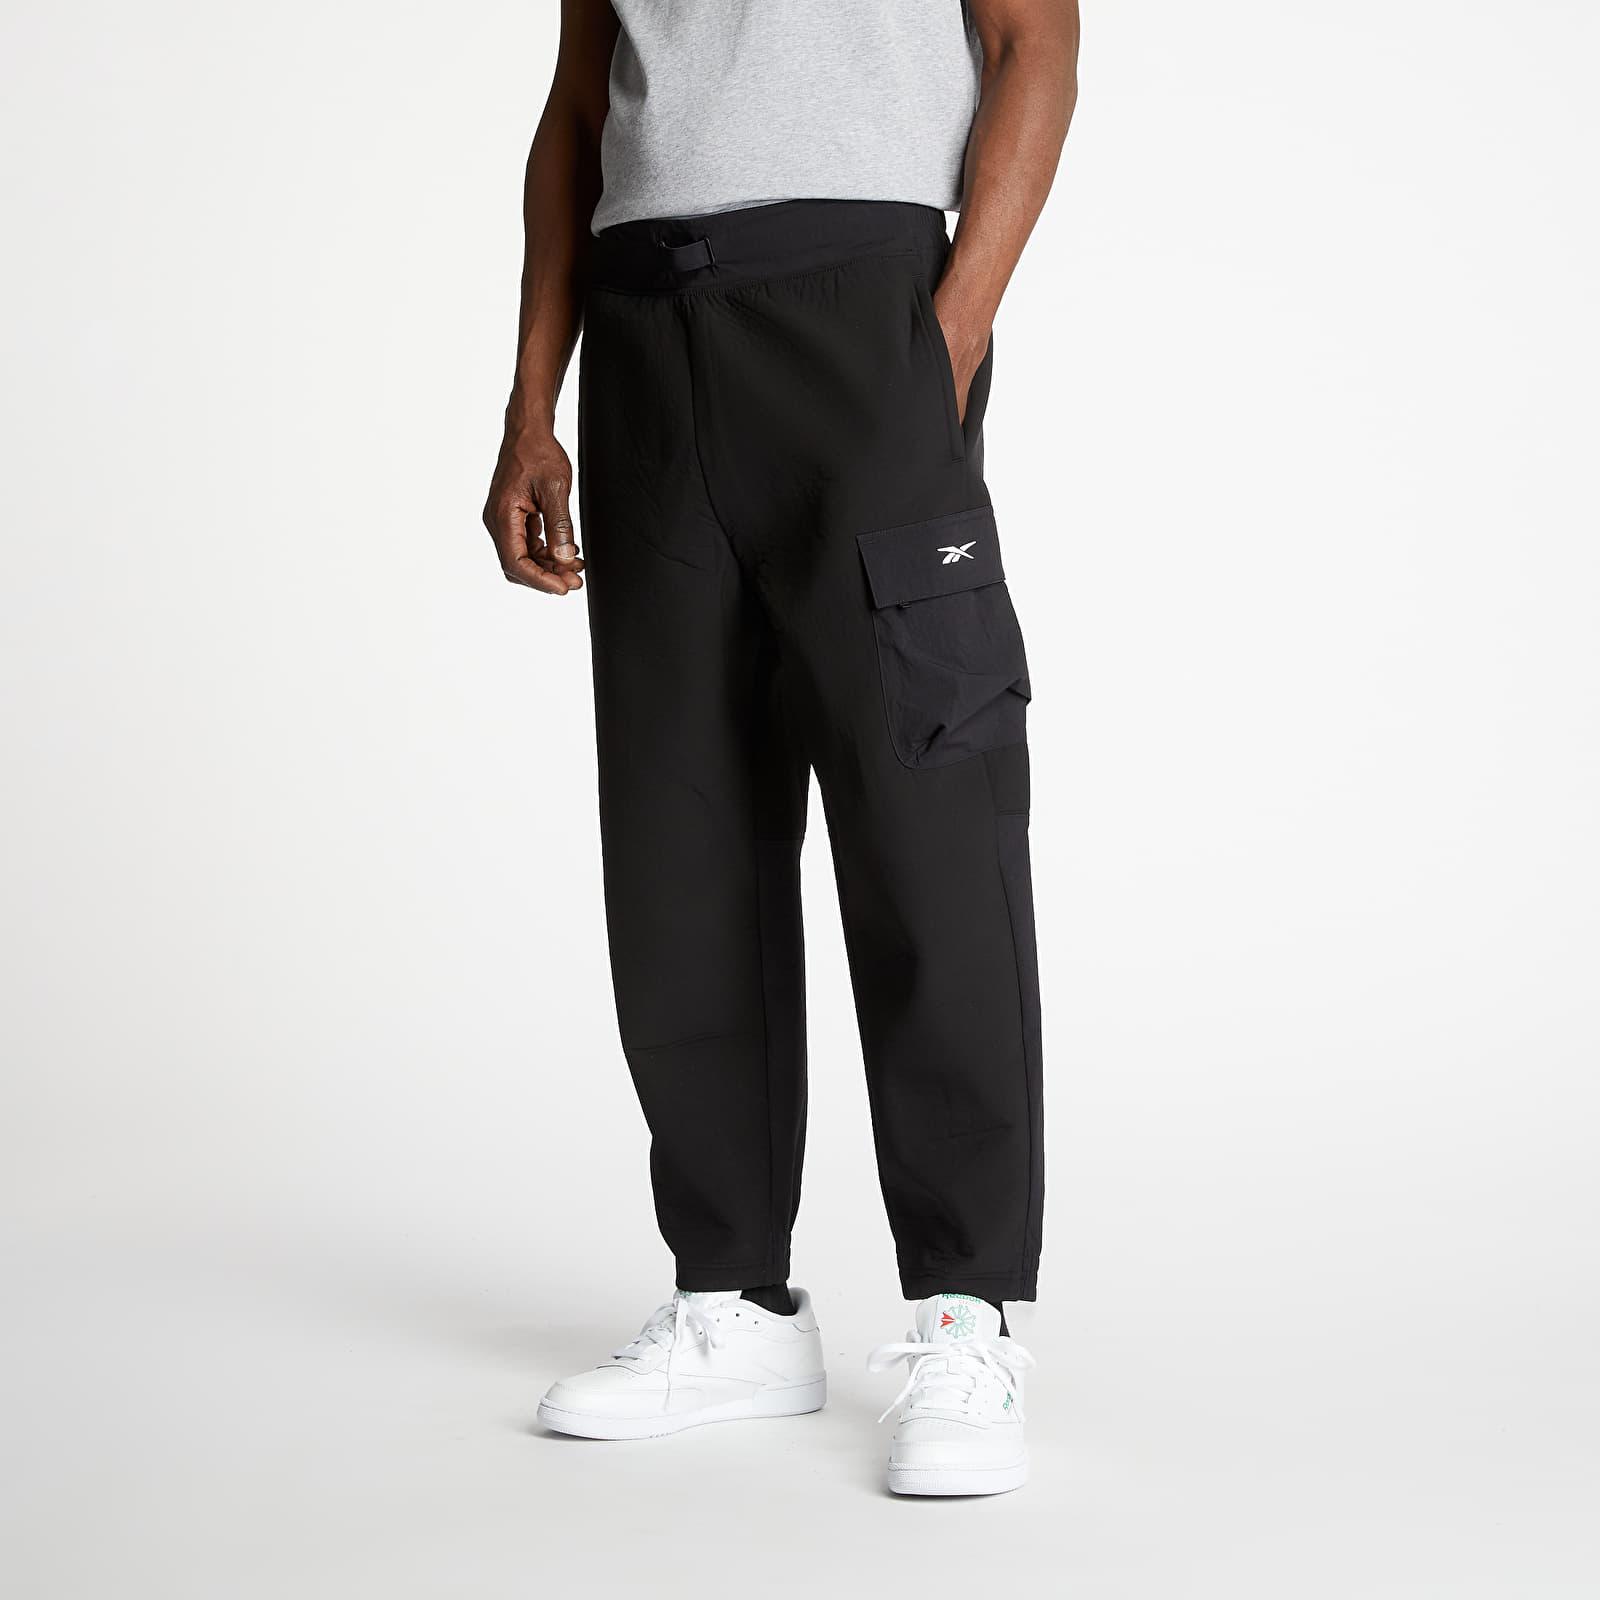 Pants and jeans Reebok TS Edgeworks Pants Black